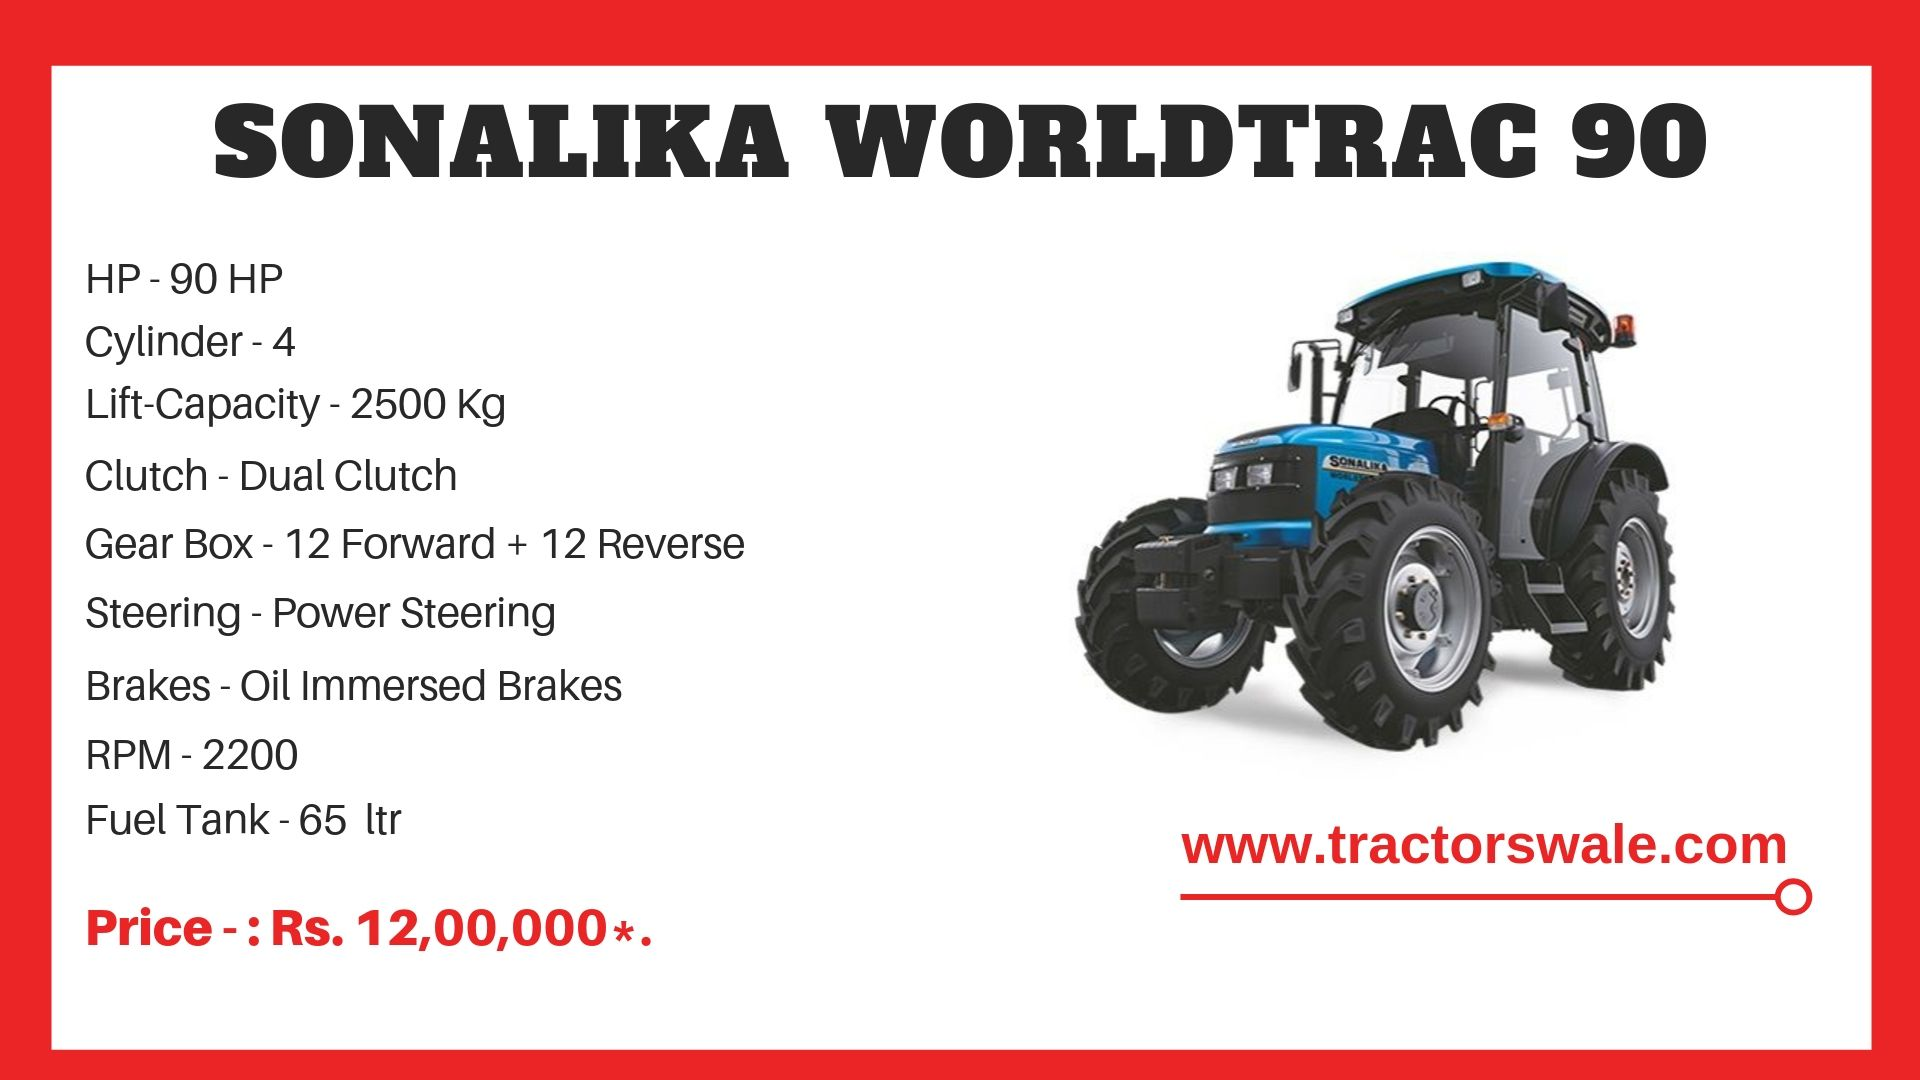 Sonalika Worldtrack 90 tractor price